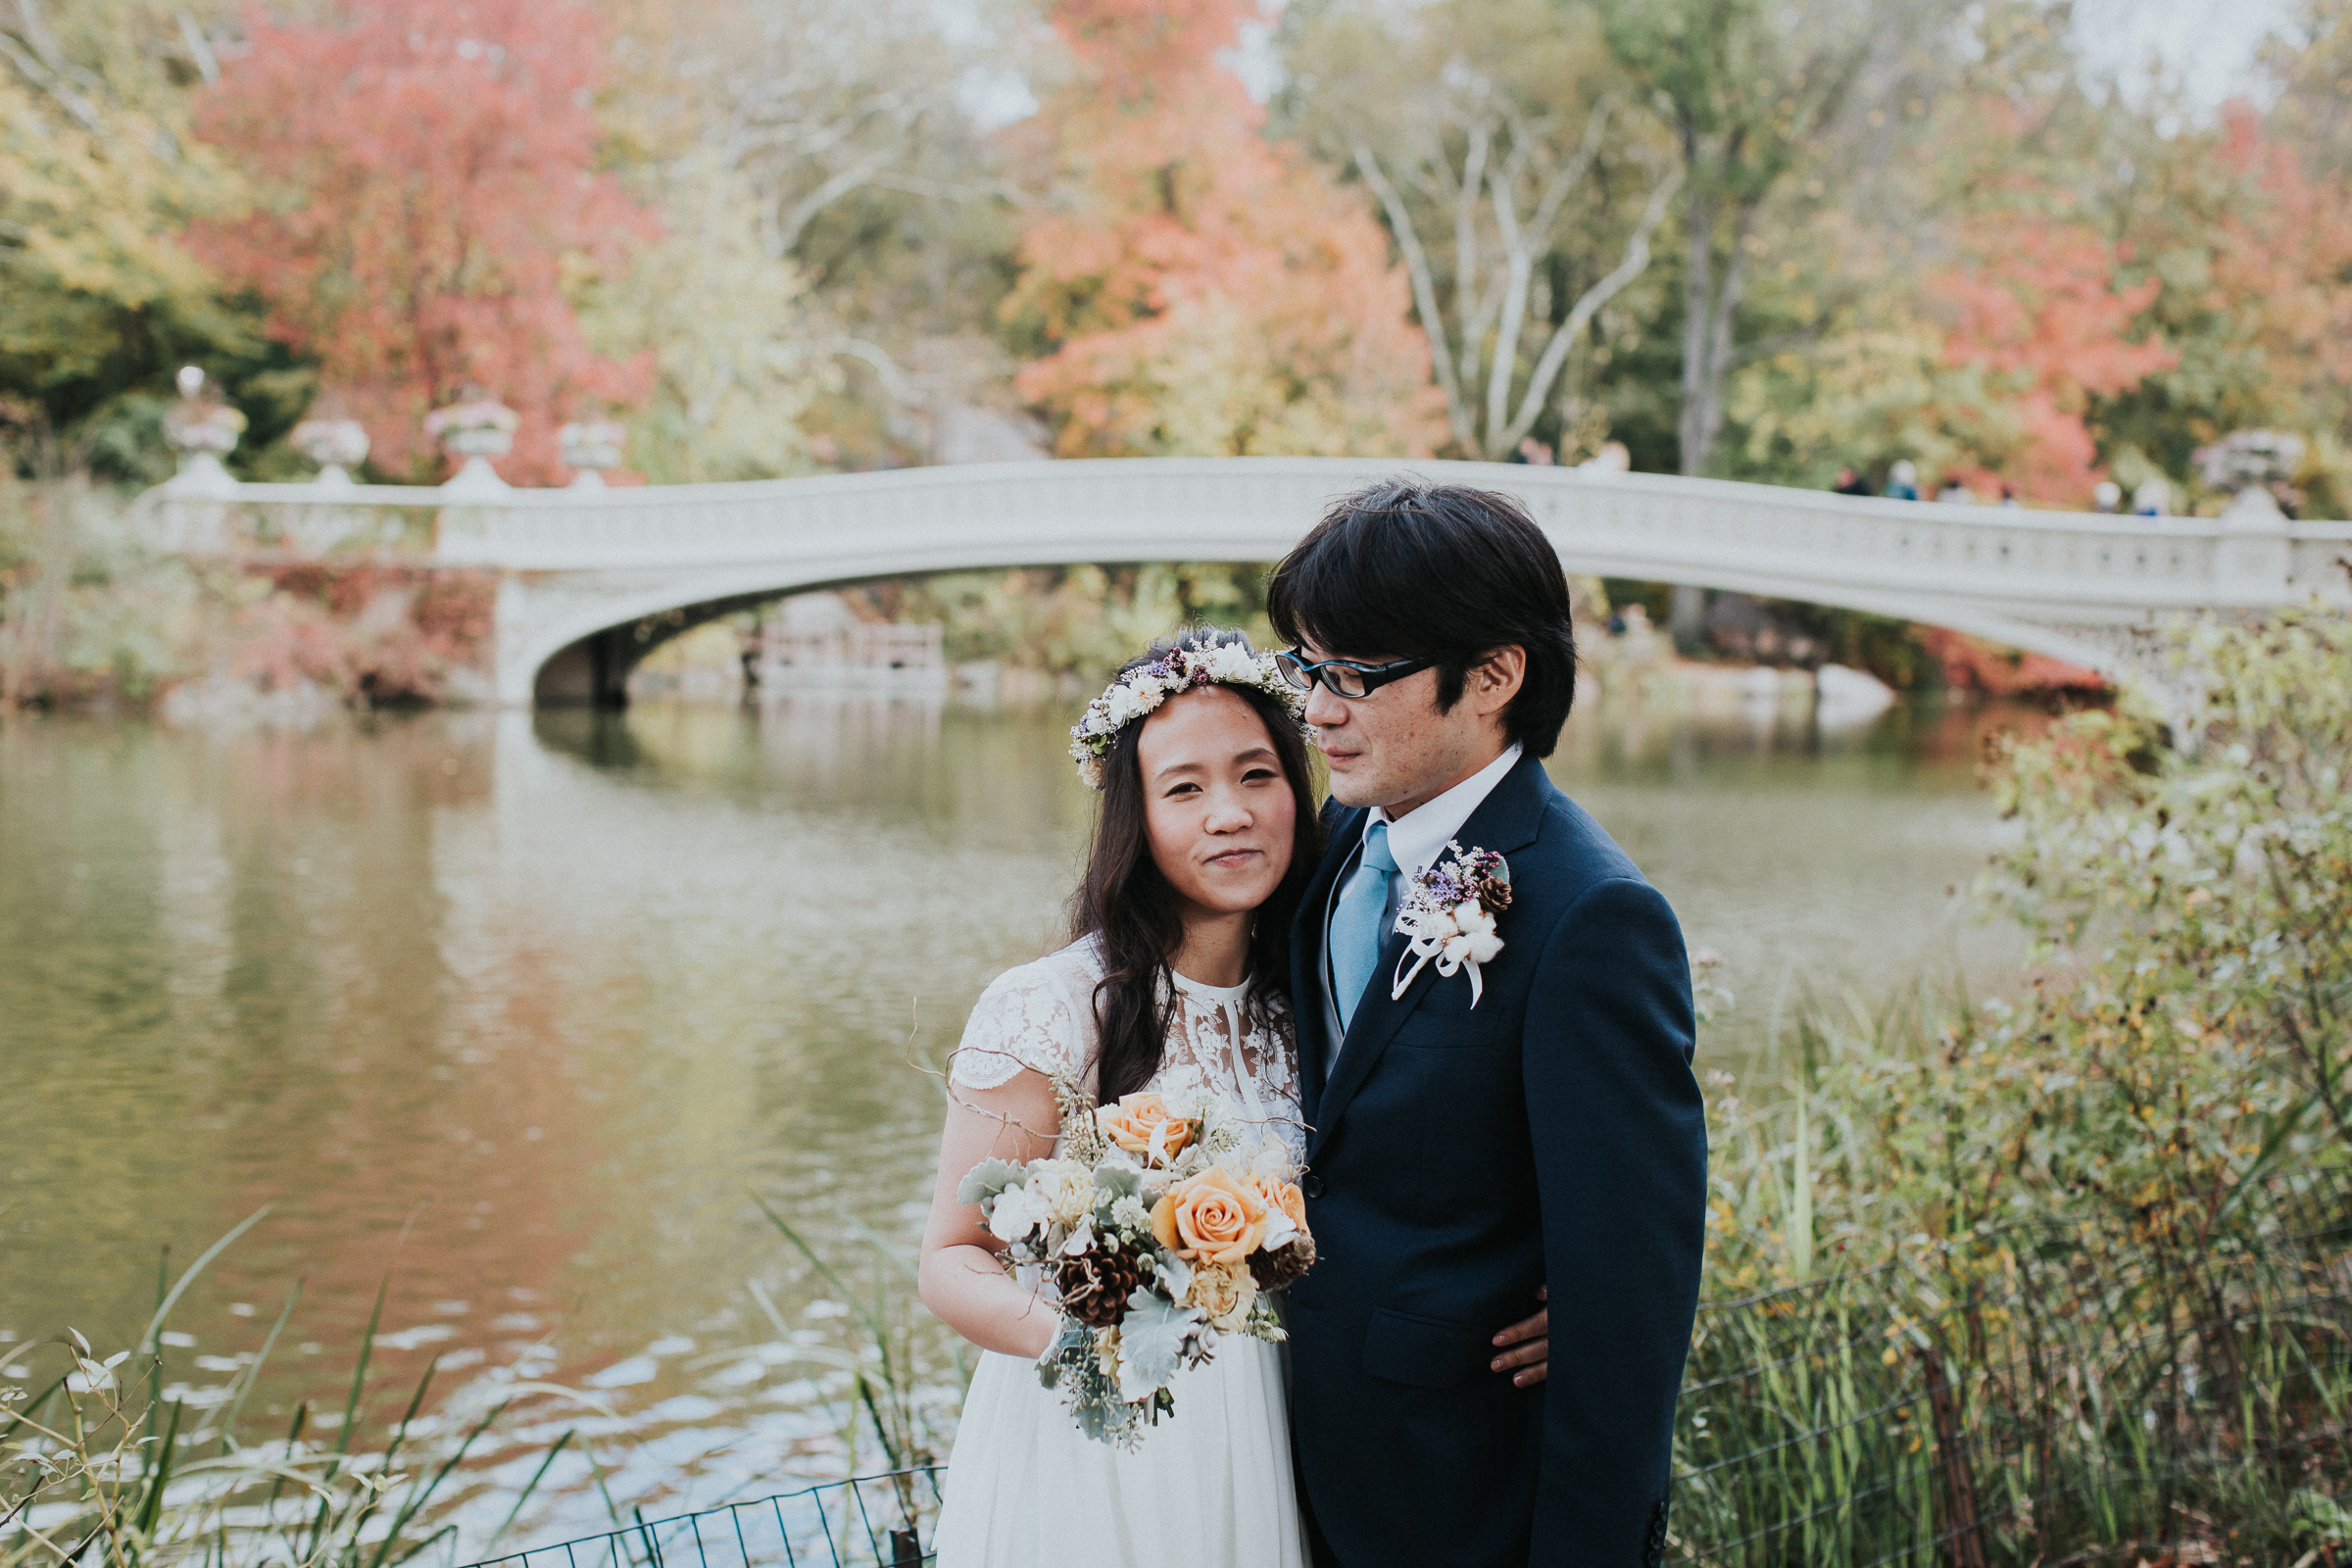 Central-Park-Brooklyn-Bridge-Dumbo-NYC-Documentary-Wedding-Photographer-37.jpg